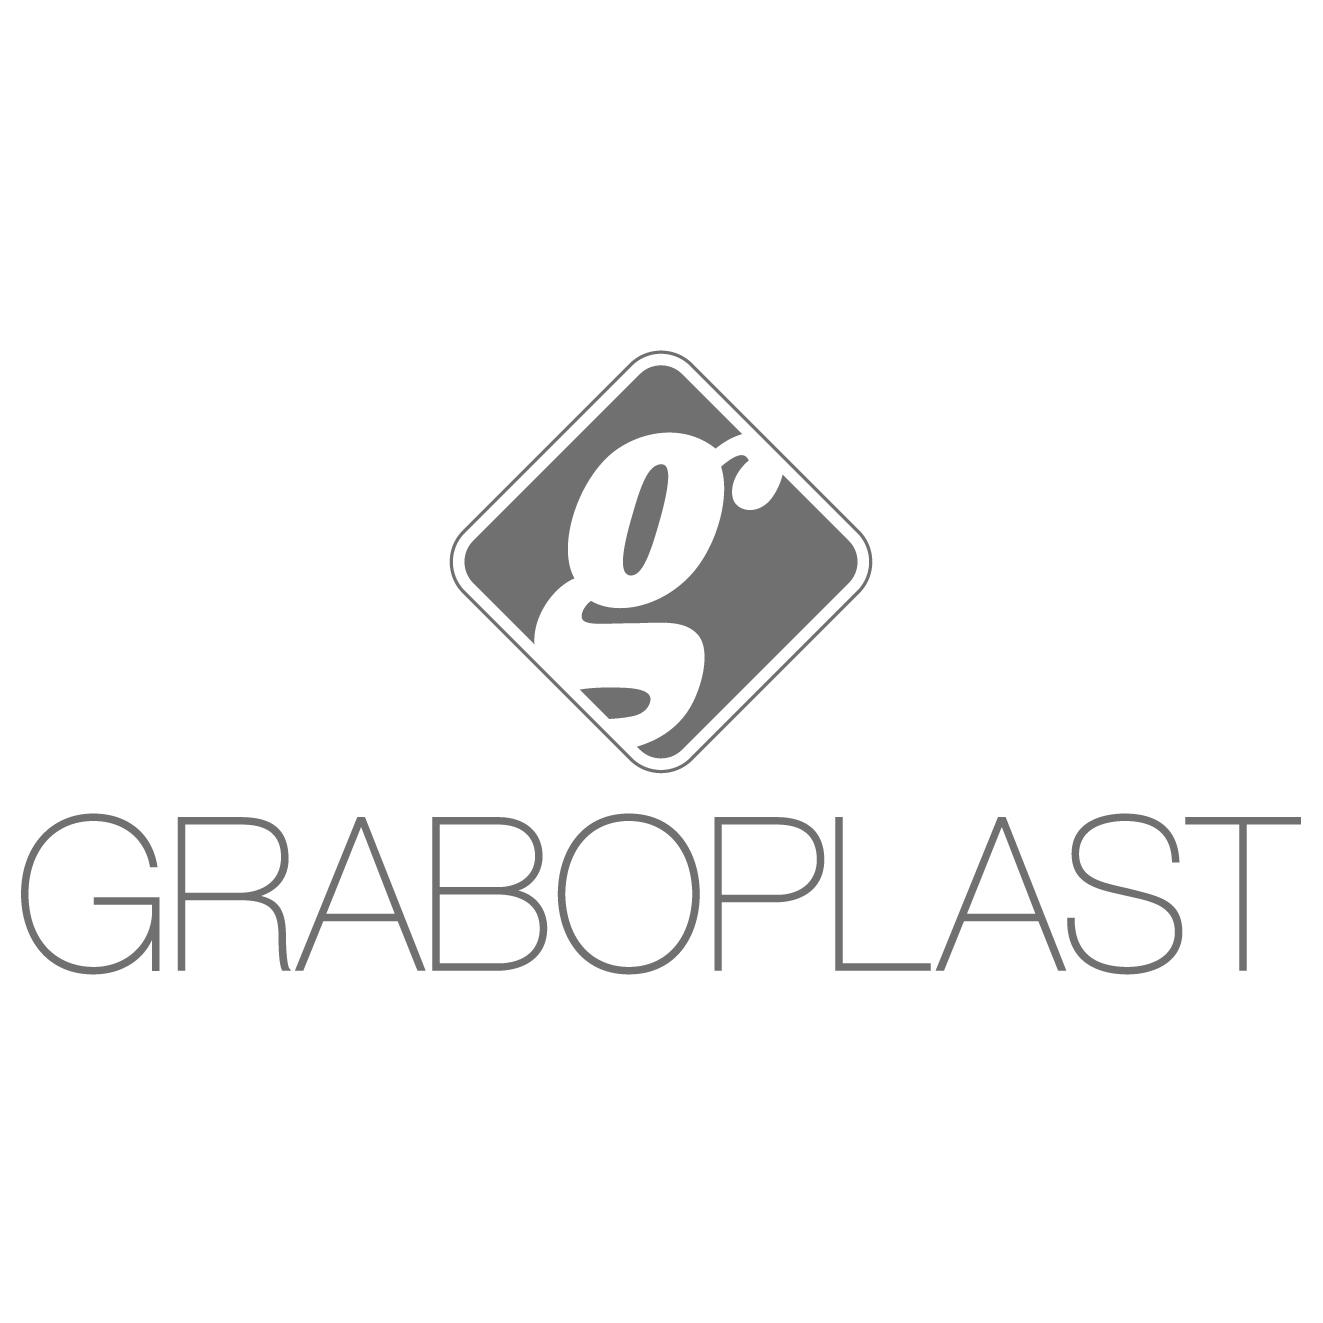 Graboplast_001-02_Graboplast_vertical_spot23 m+бsolata